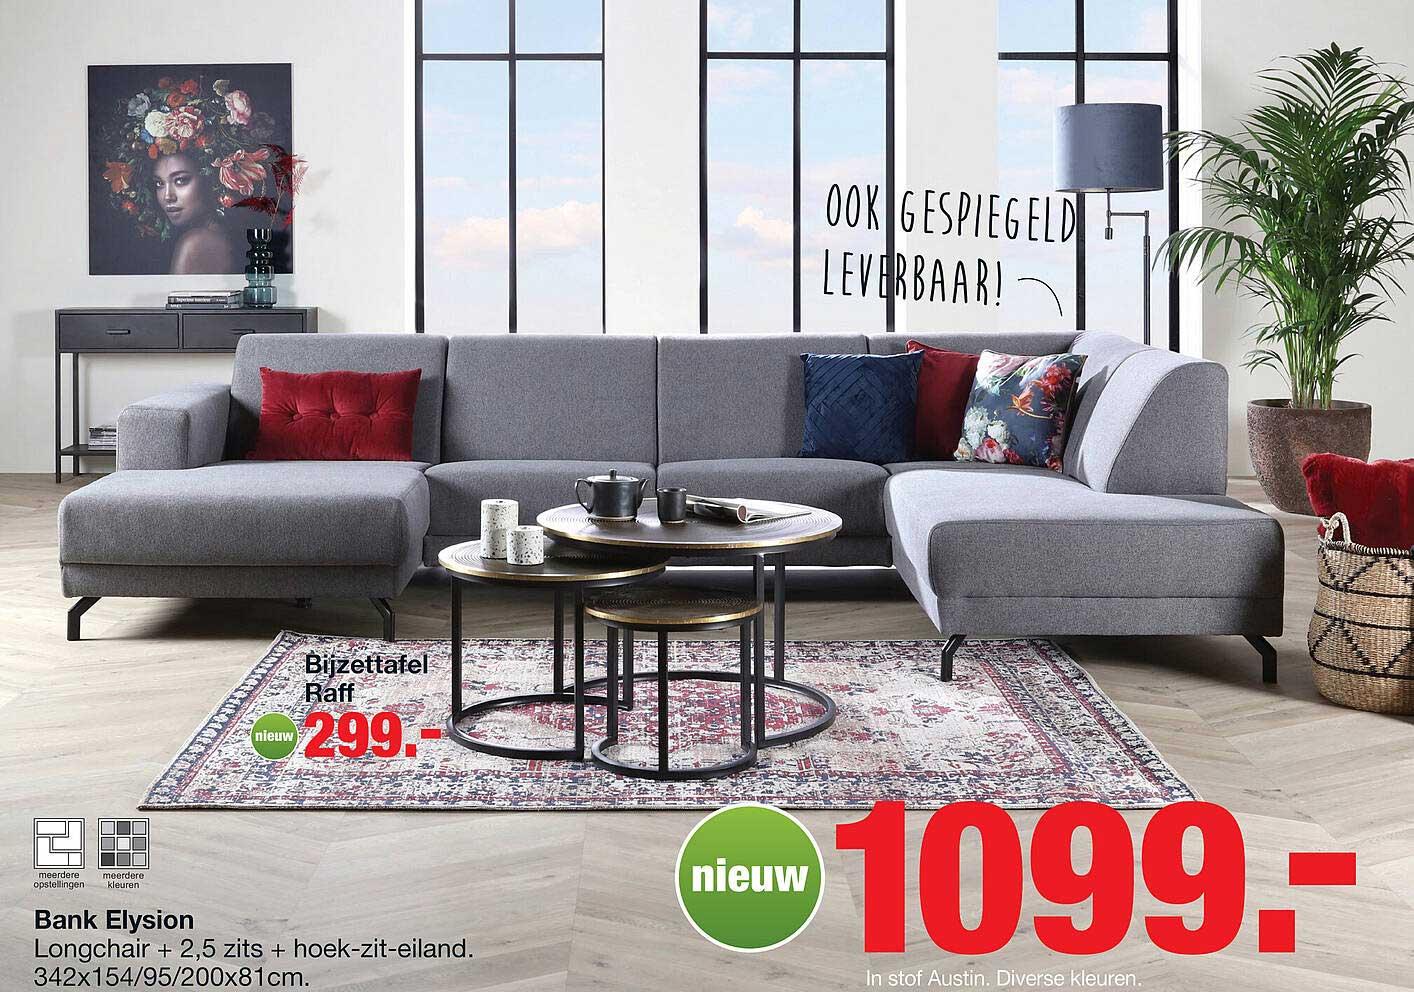 Budget Home Store Bijzettafel Raff Of Bank Elysion